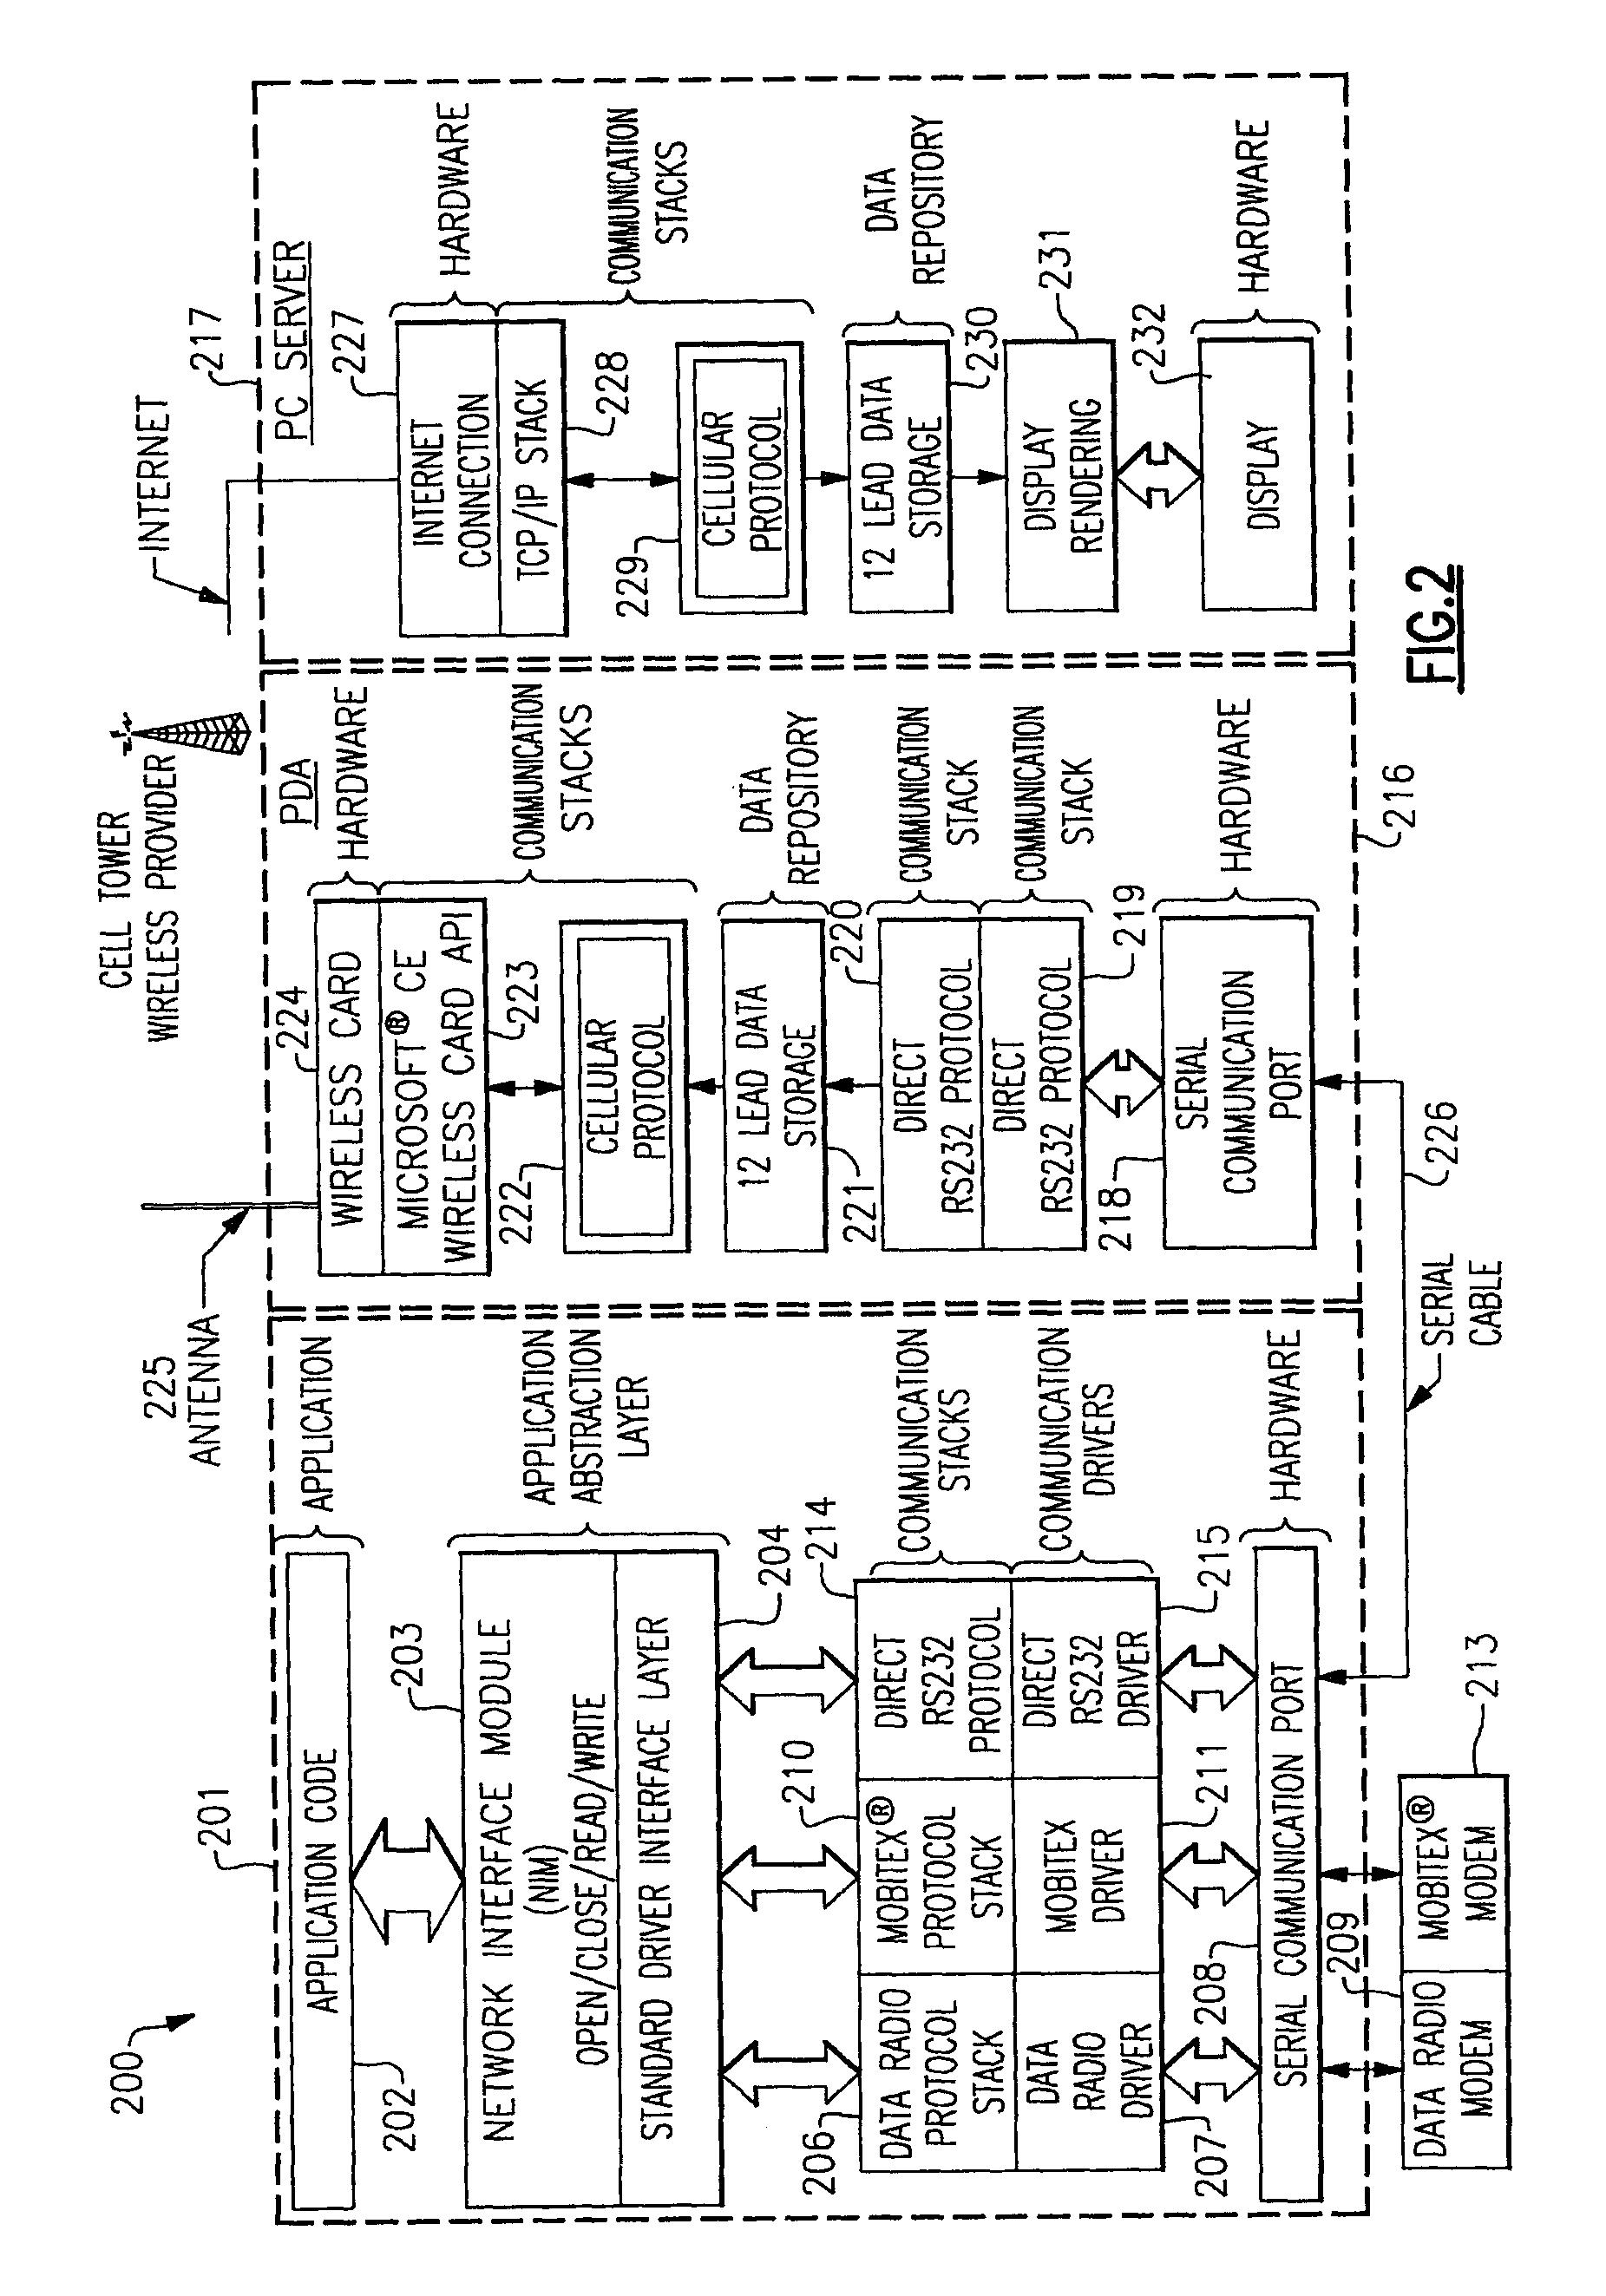 autopage wiring diagram